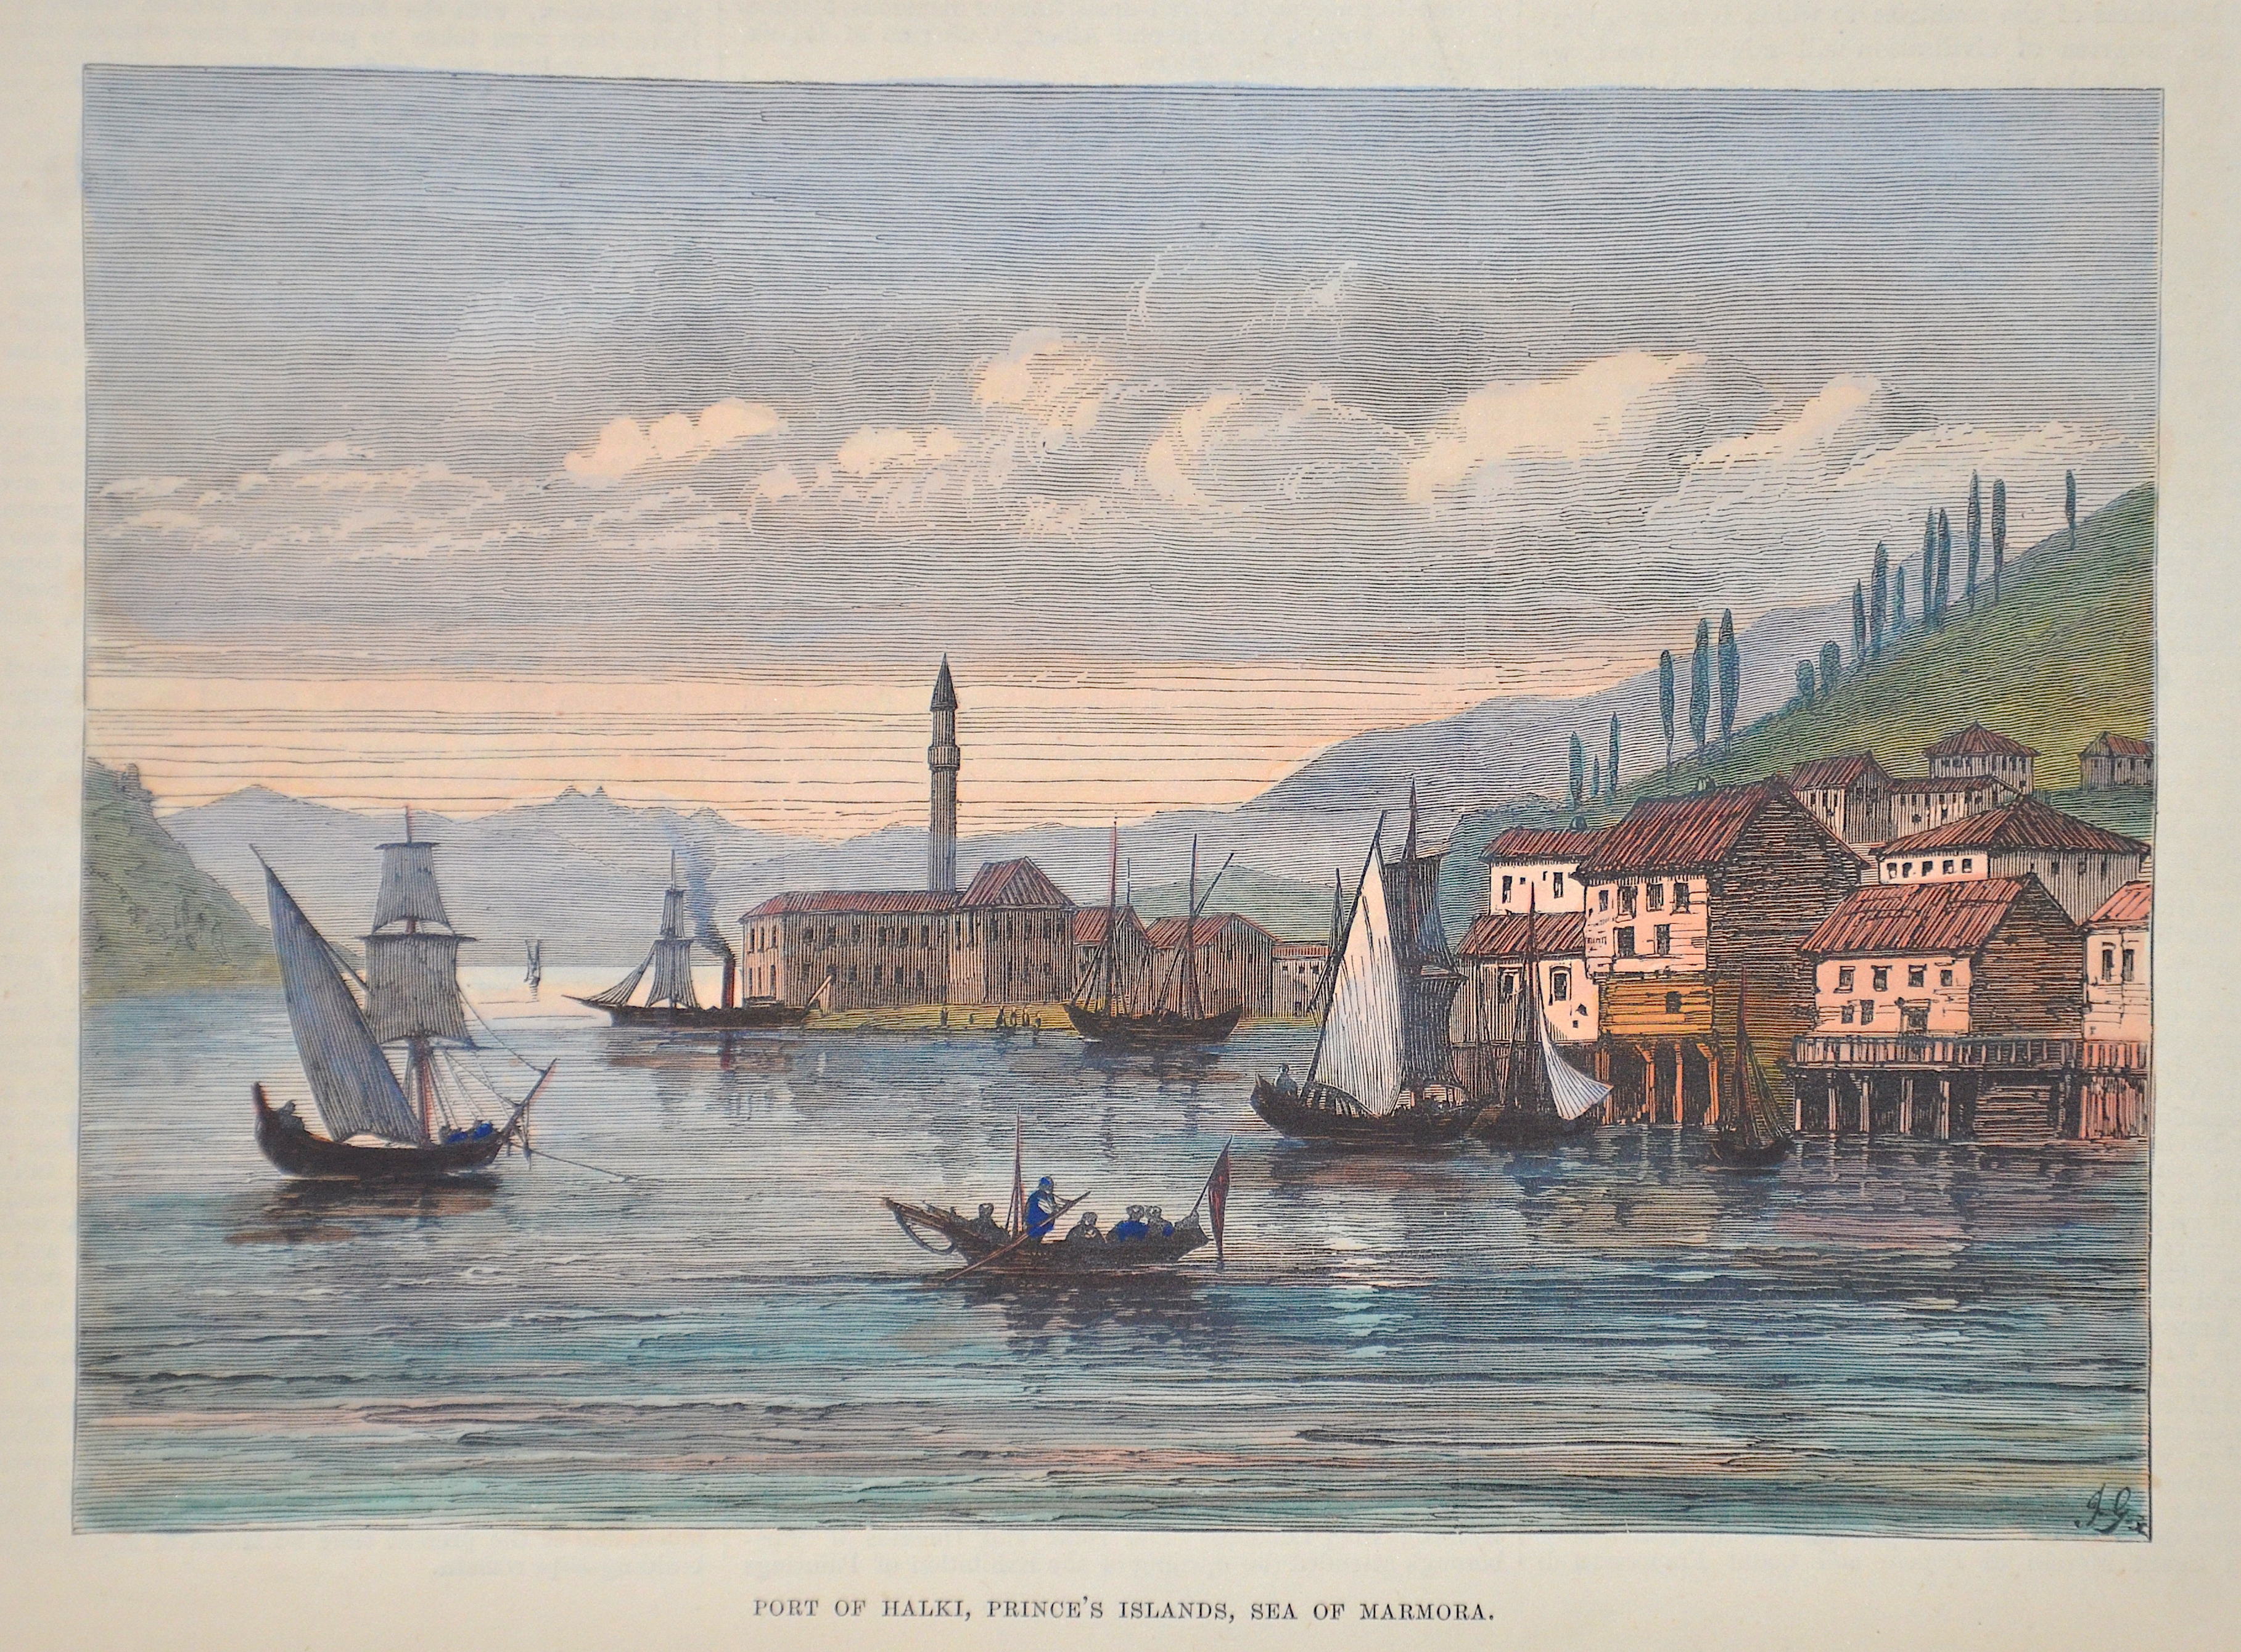 J.G.  Port of Halki, Princes islands, Sea of Marmora